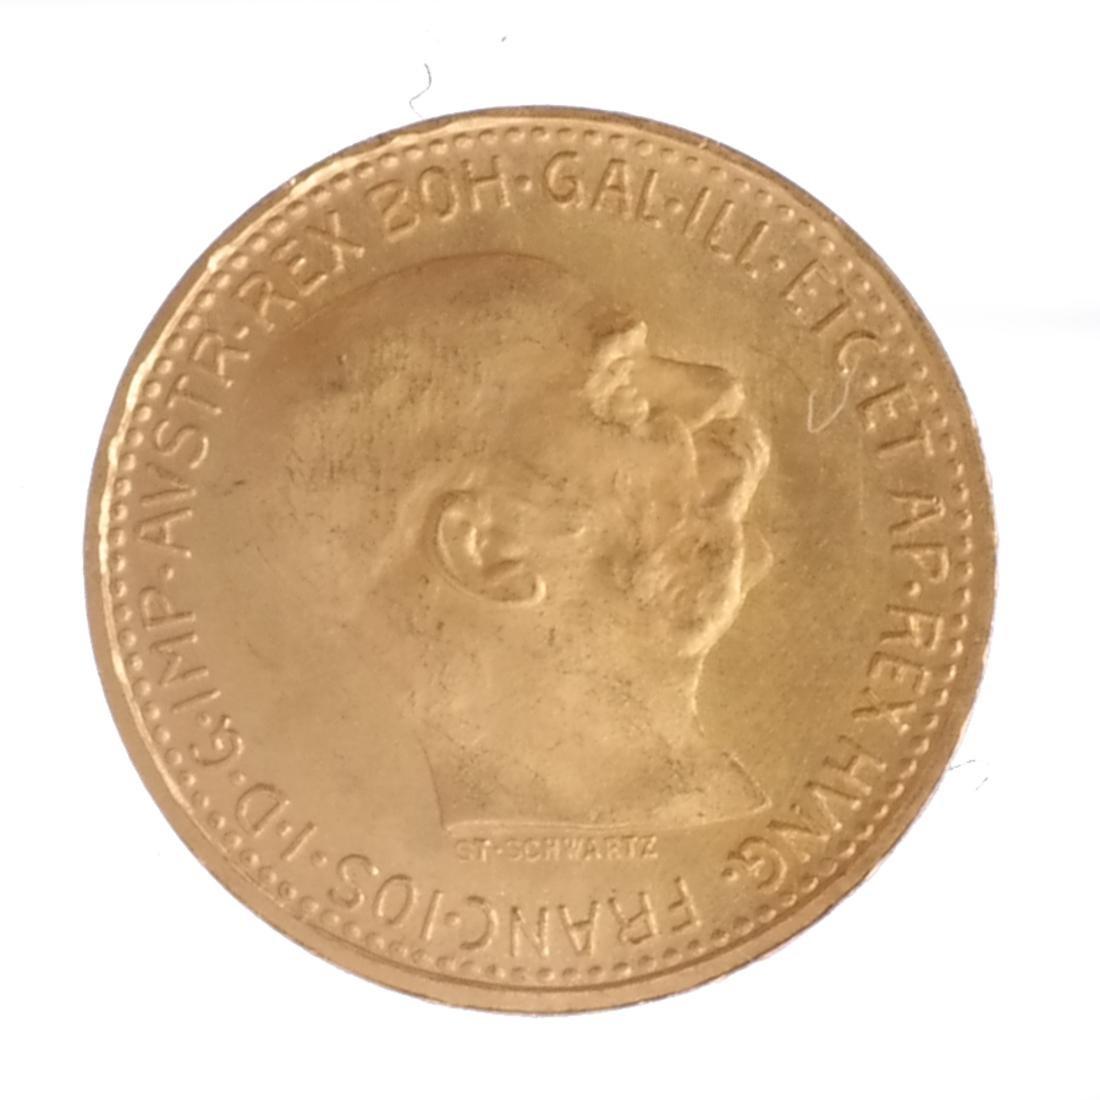 2 Gold, 10 Corona Austria, 1 Australia - 4